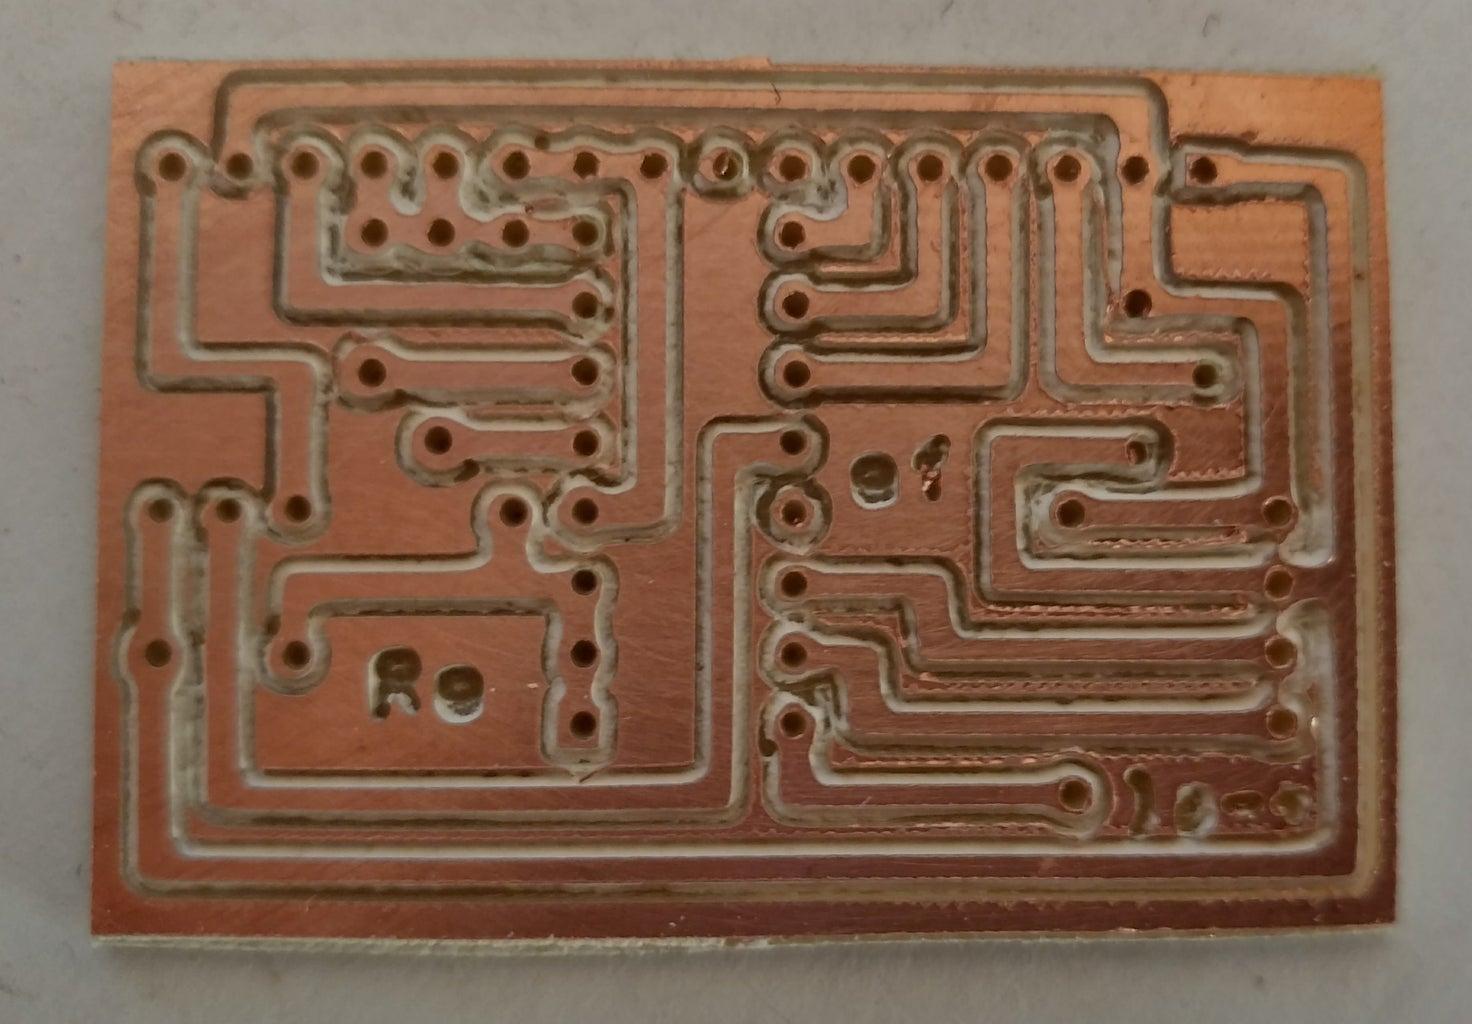 Milling PCB